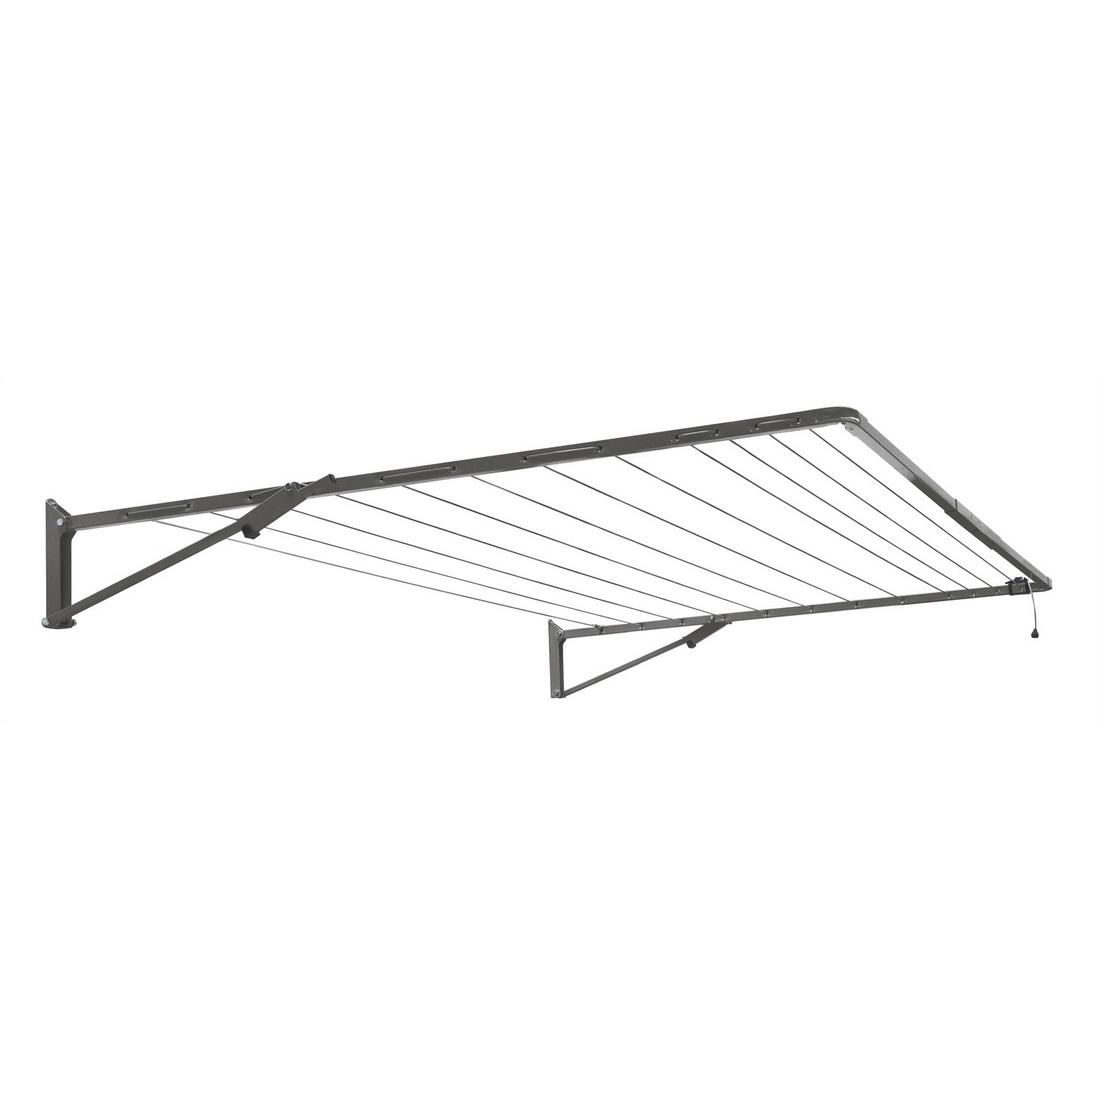 Standard Fold Down Clothesline Woodland Grey 2.49 x 1.5m